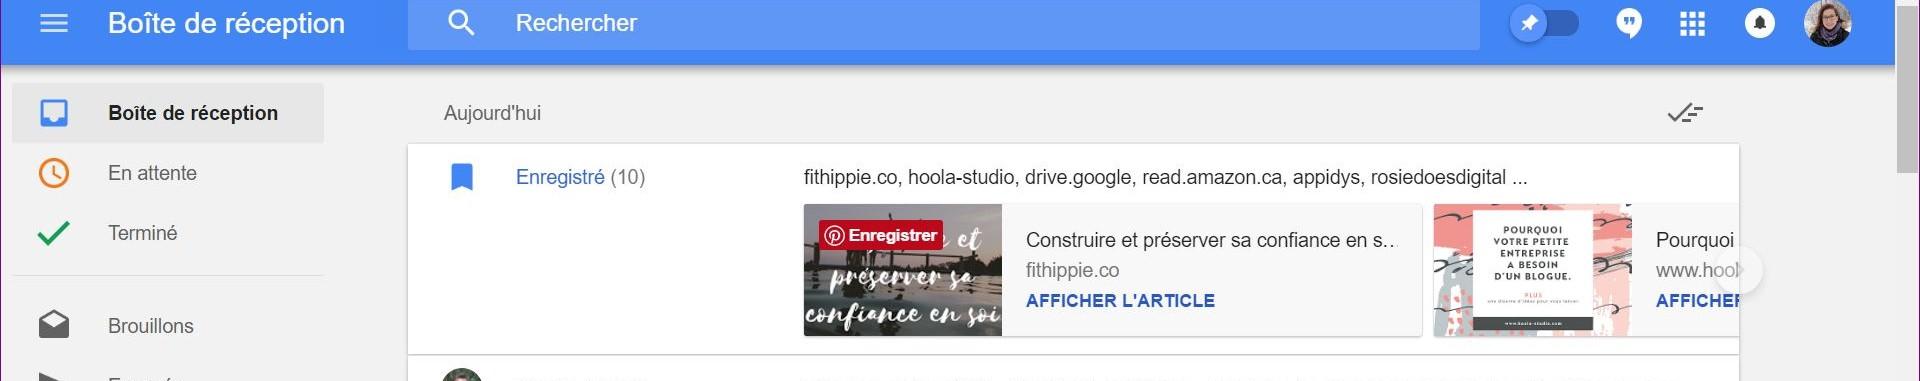 Exemple d'articles enregistrés dans Google Inbox